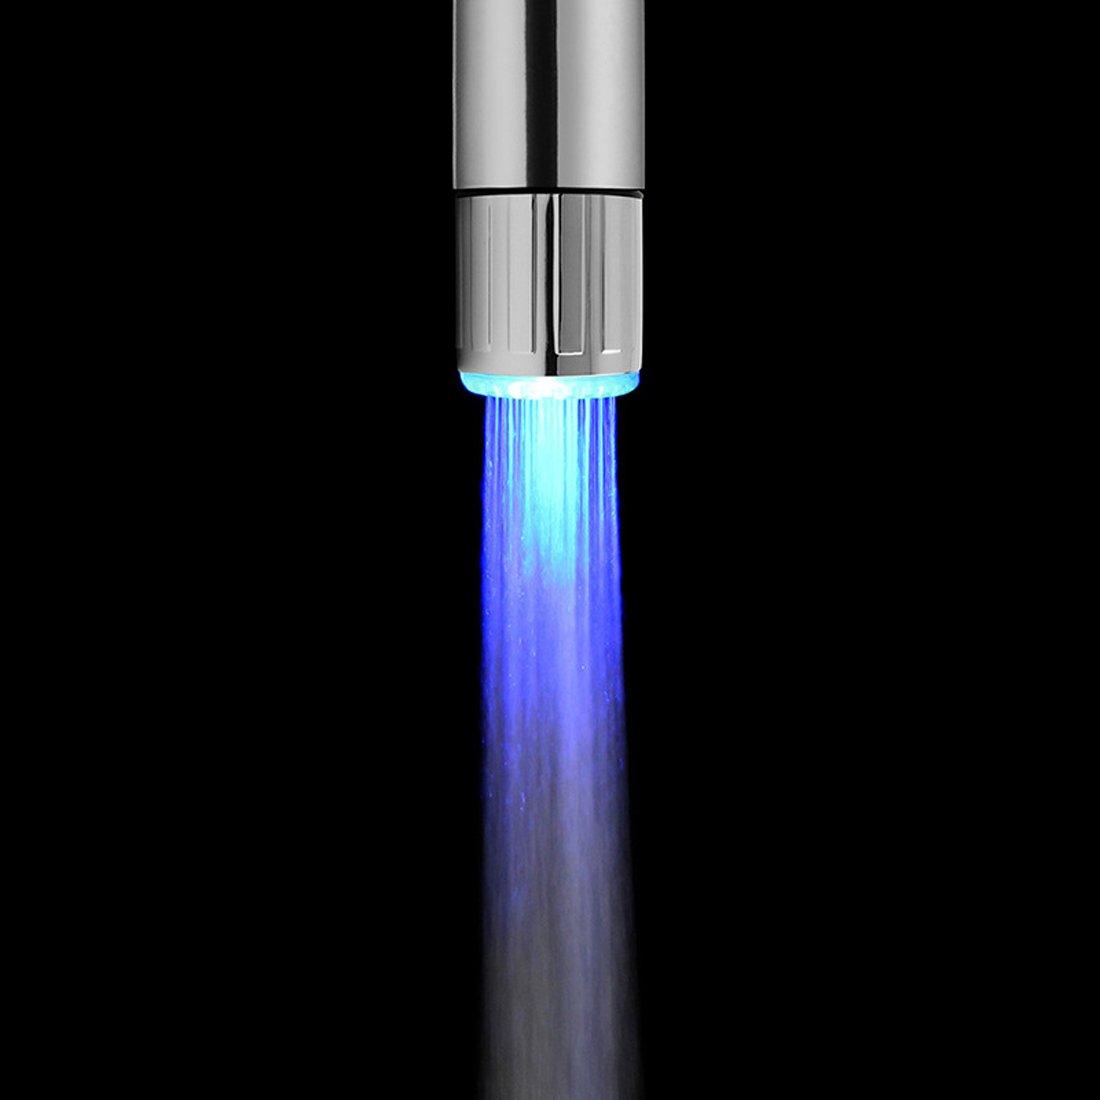 Multicolor Changing LED Light Water Faucet Temperature Sensor Water Tap